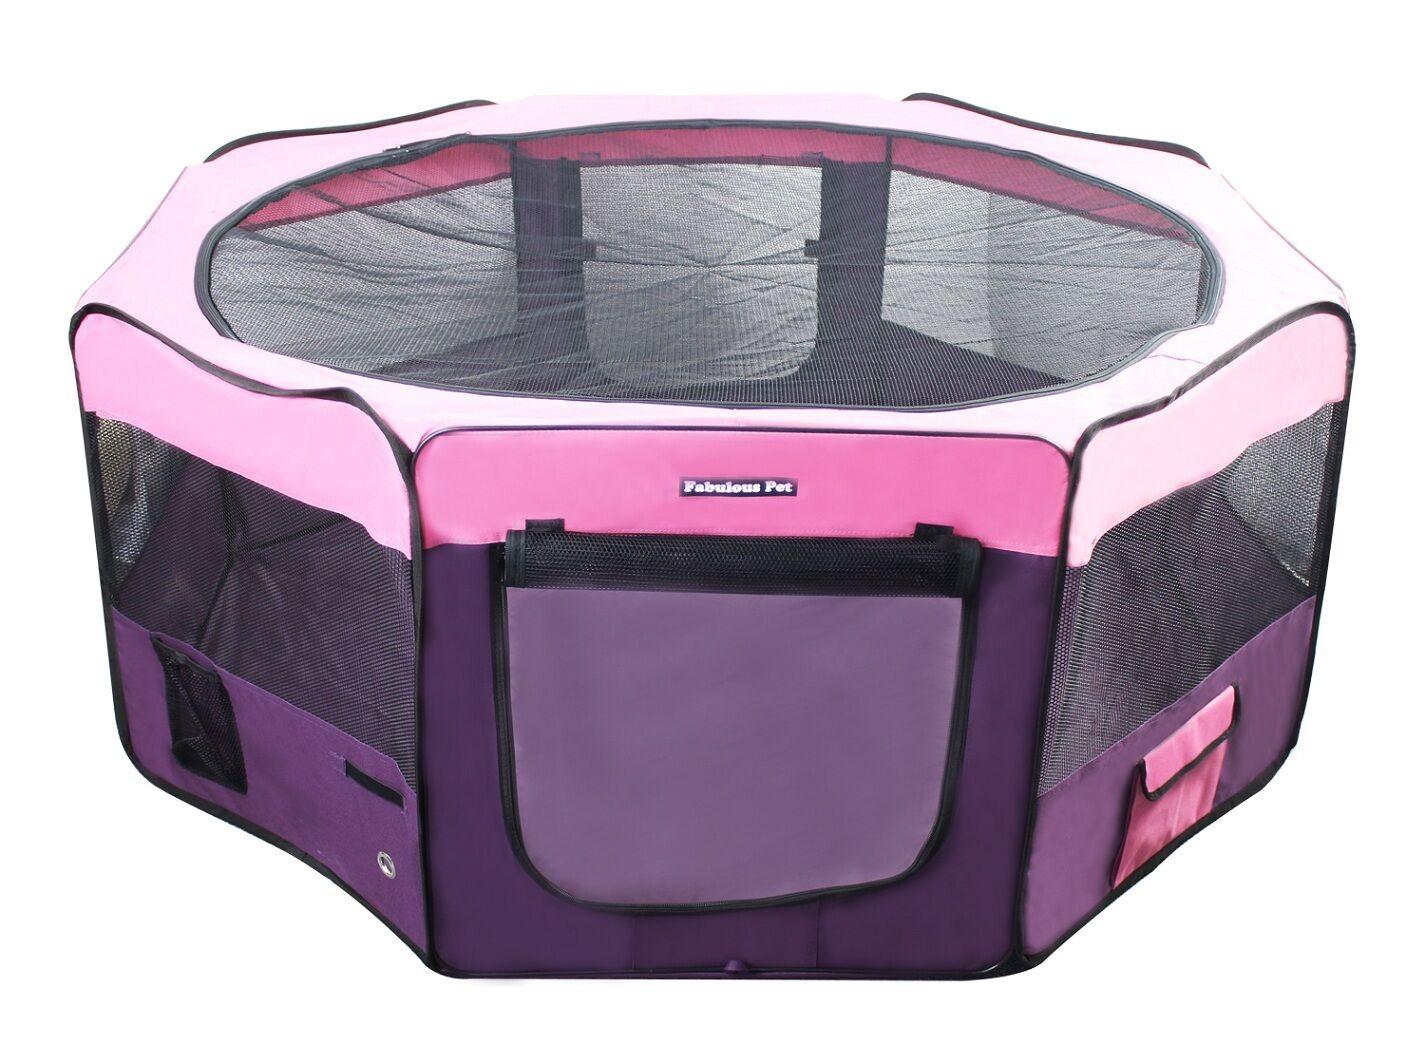 45  Portable Puppy Pet Dog Soft Tent Playpen Folding Crate Pen New - rosa viola